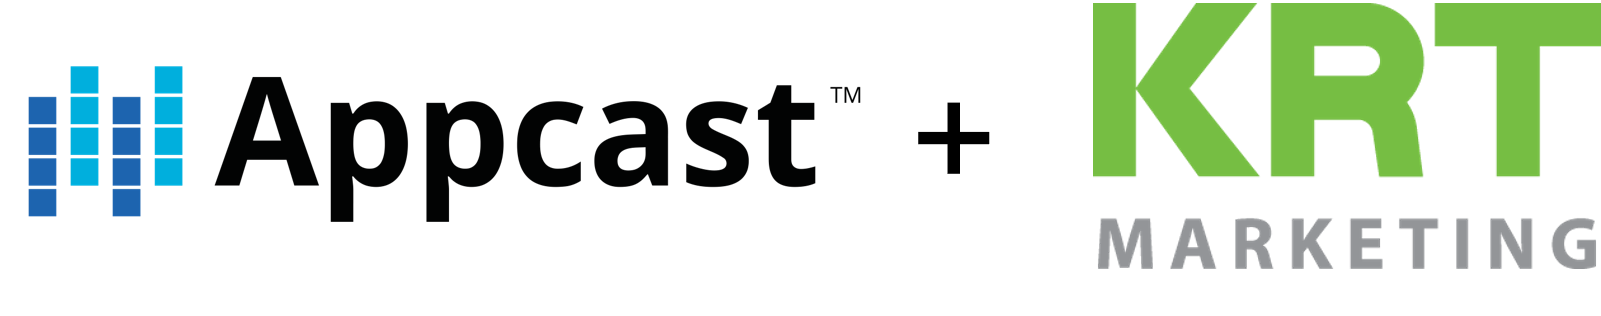 appcast+KRTco-brand.png